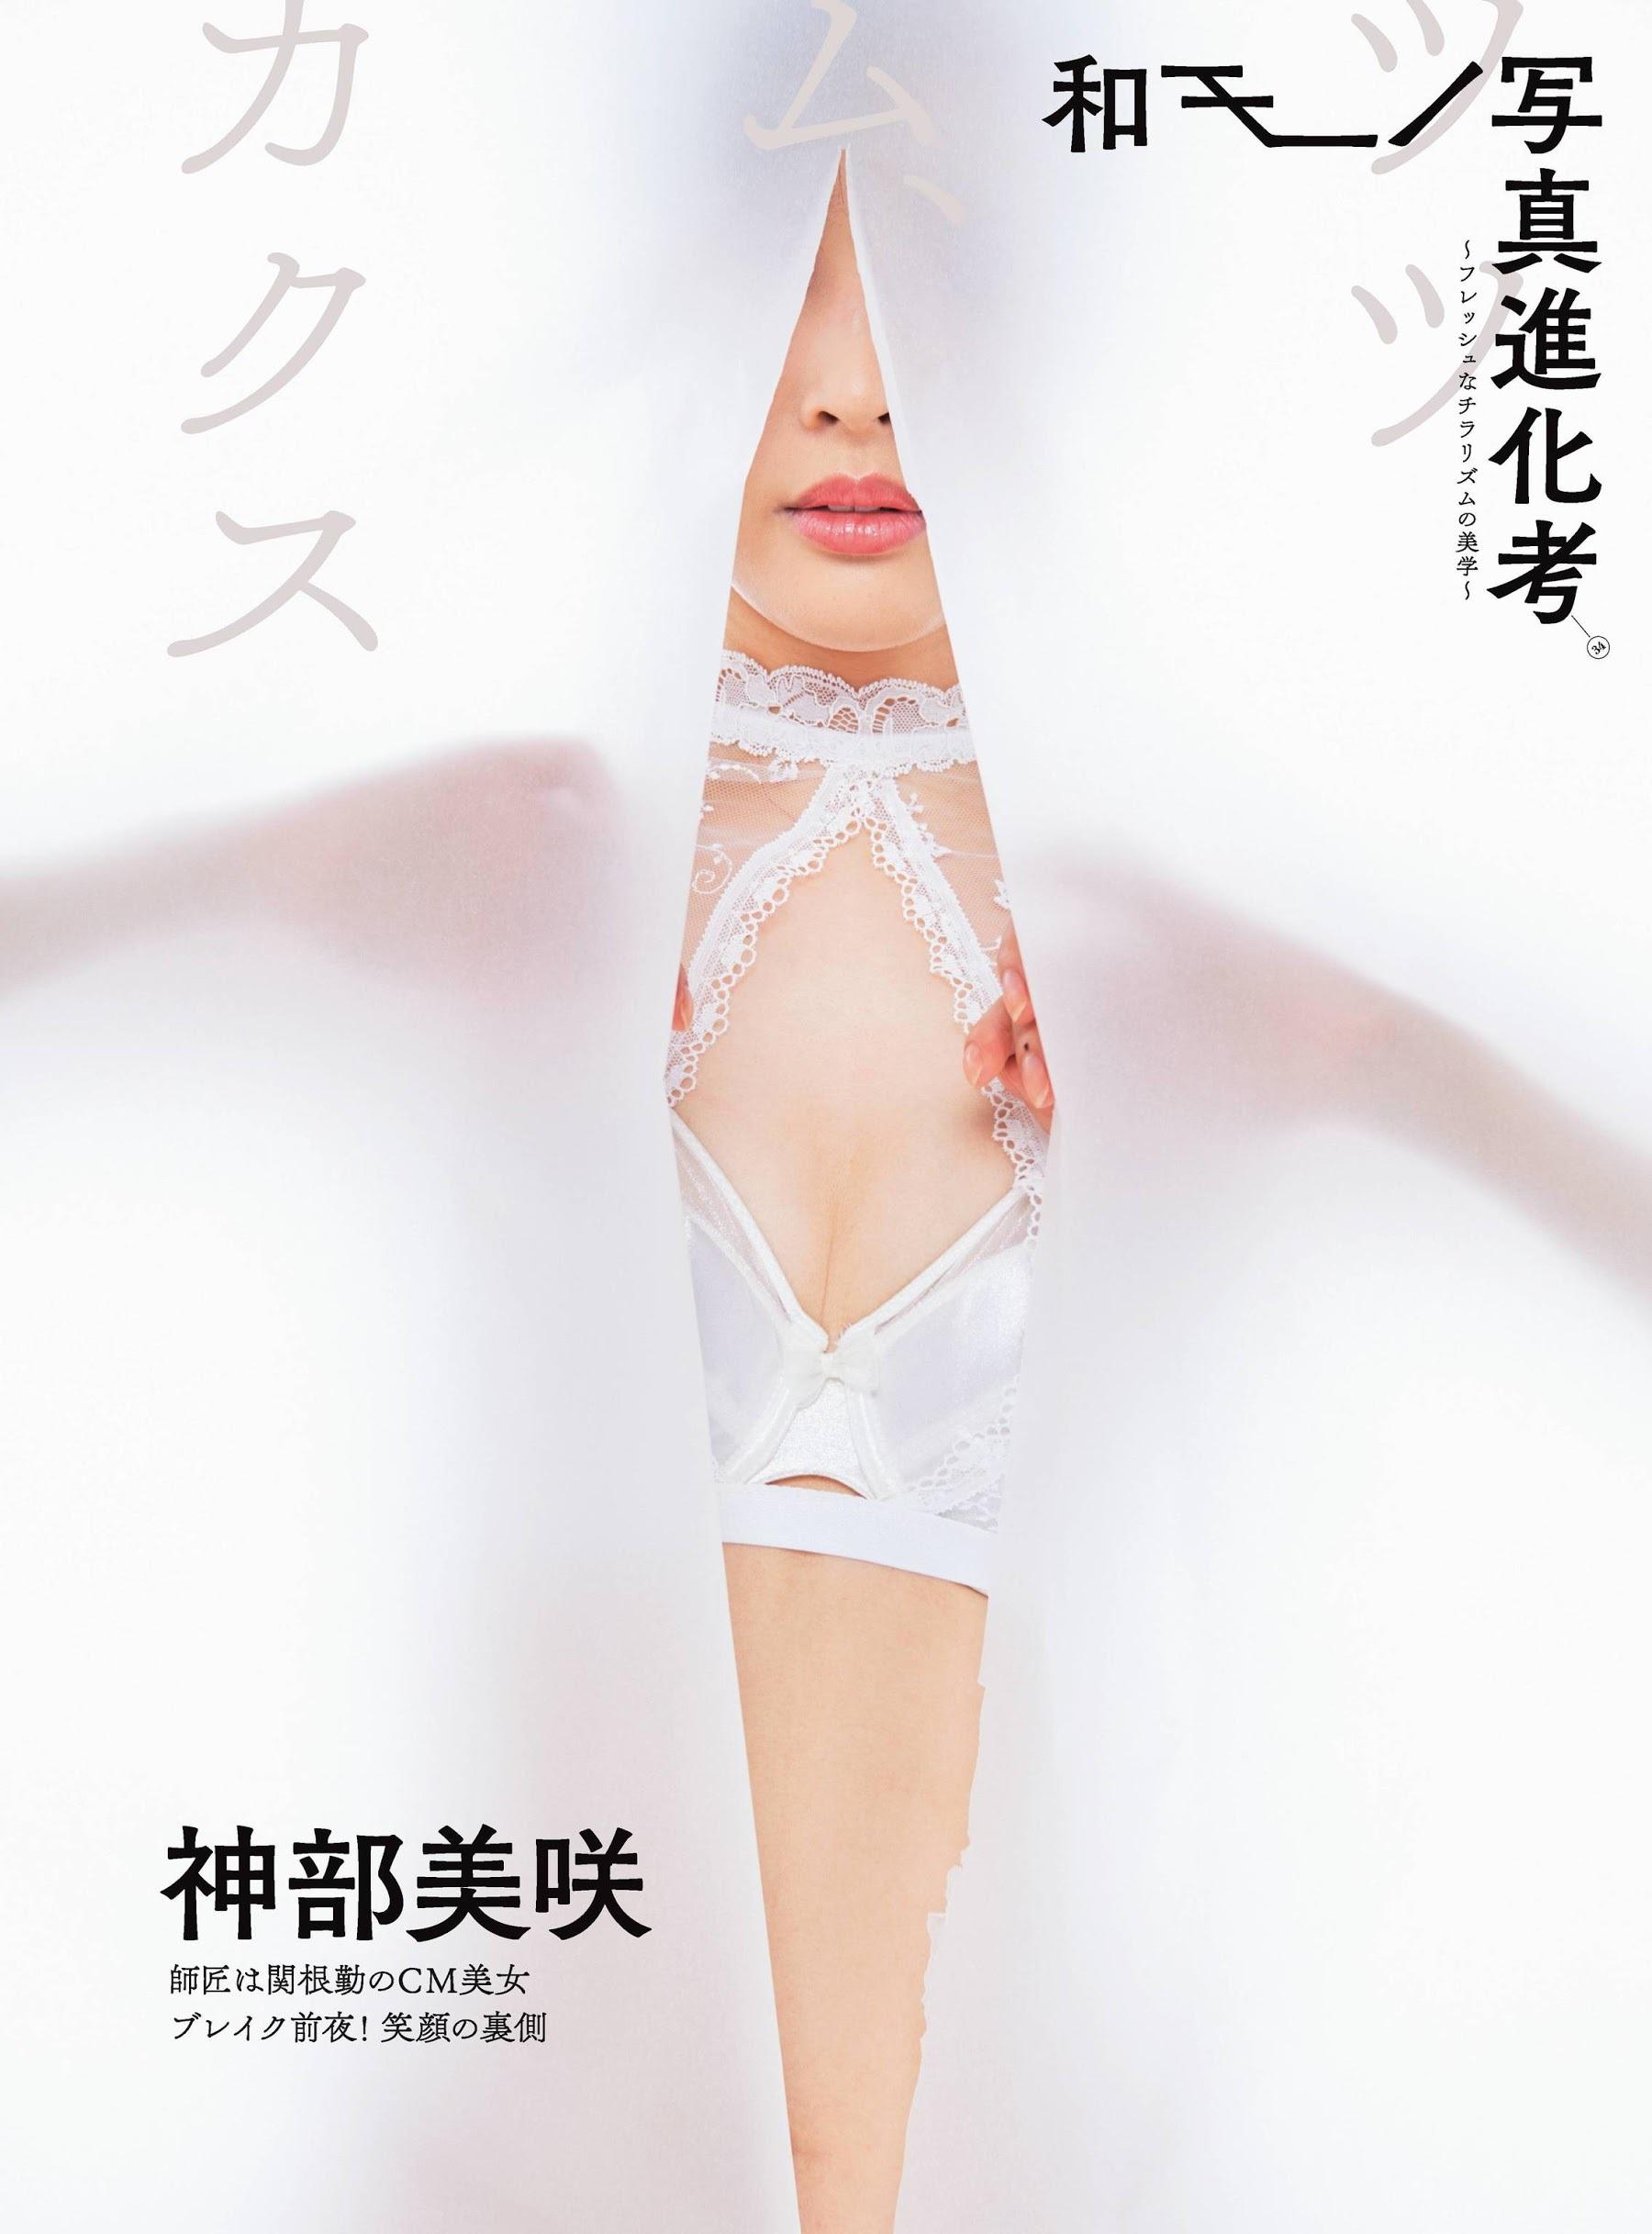 Misaki Kanbe001